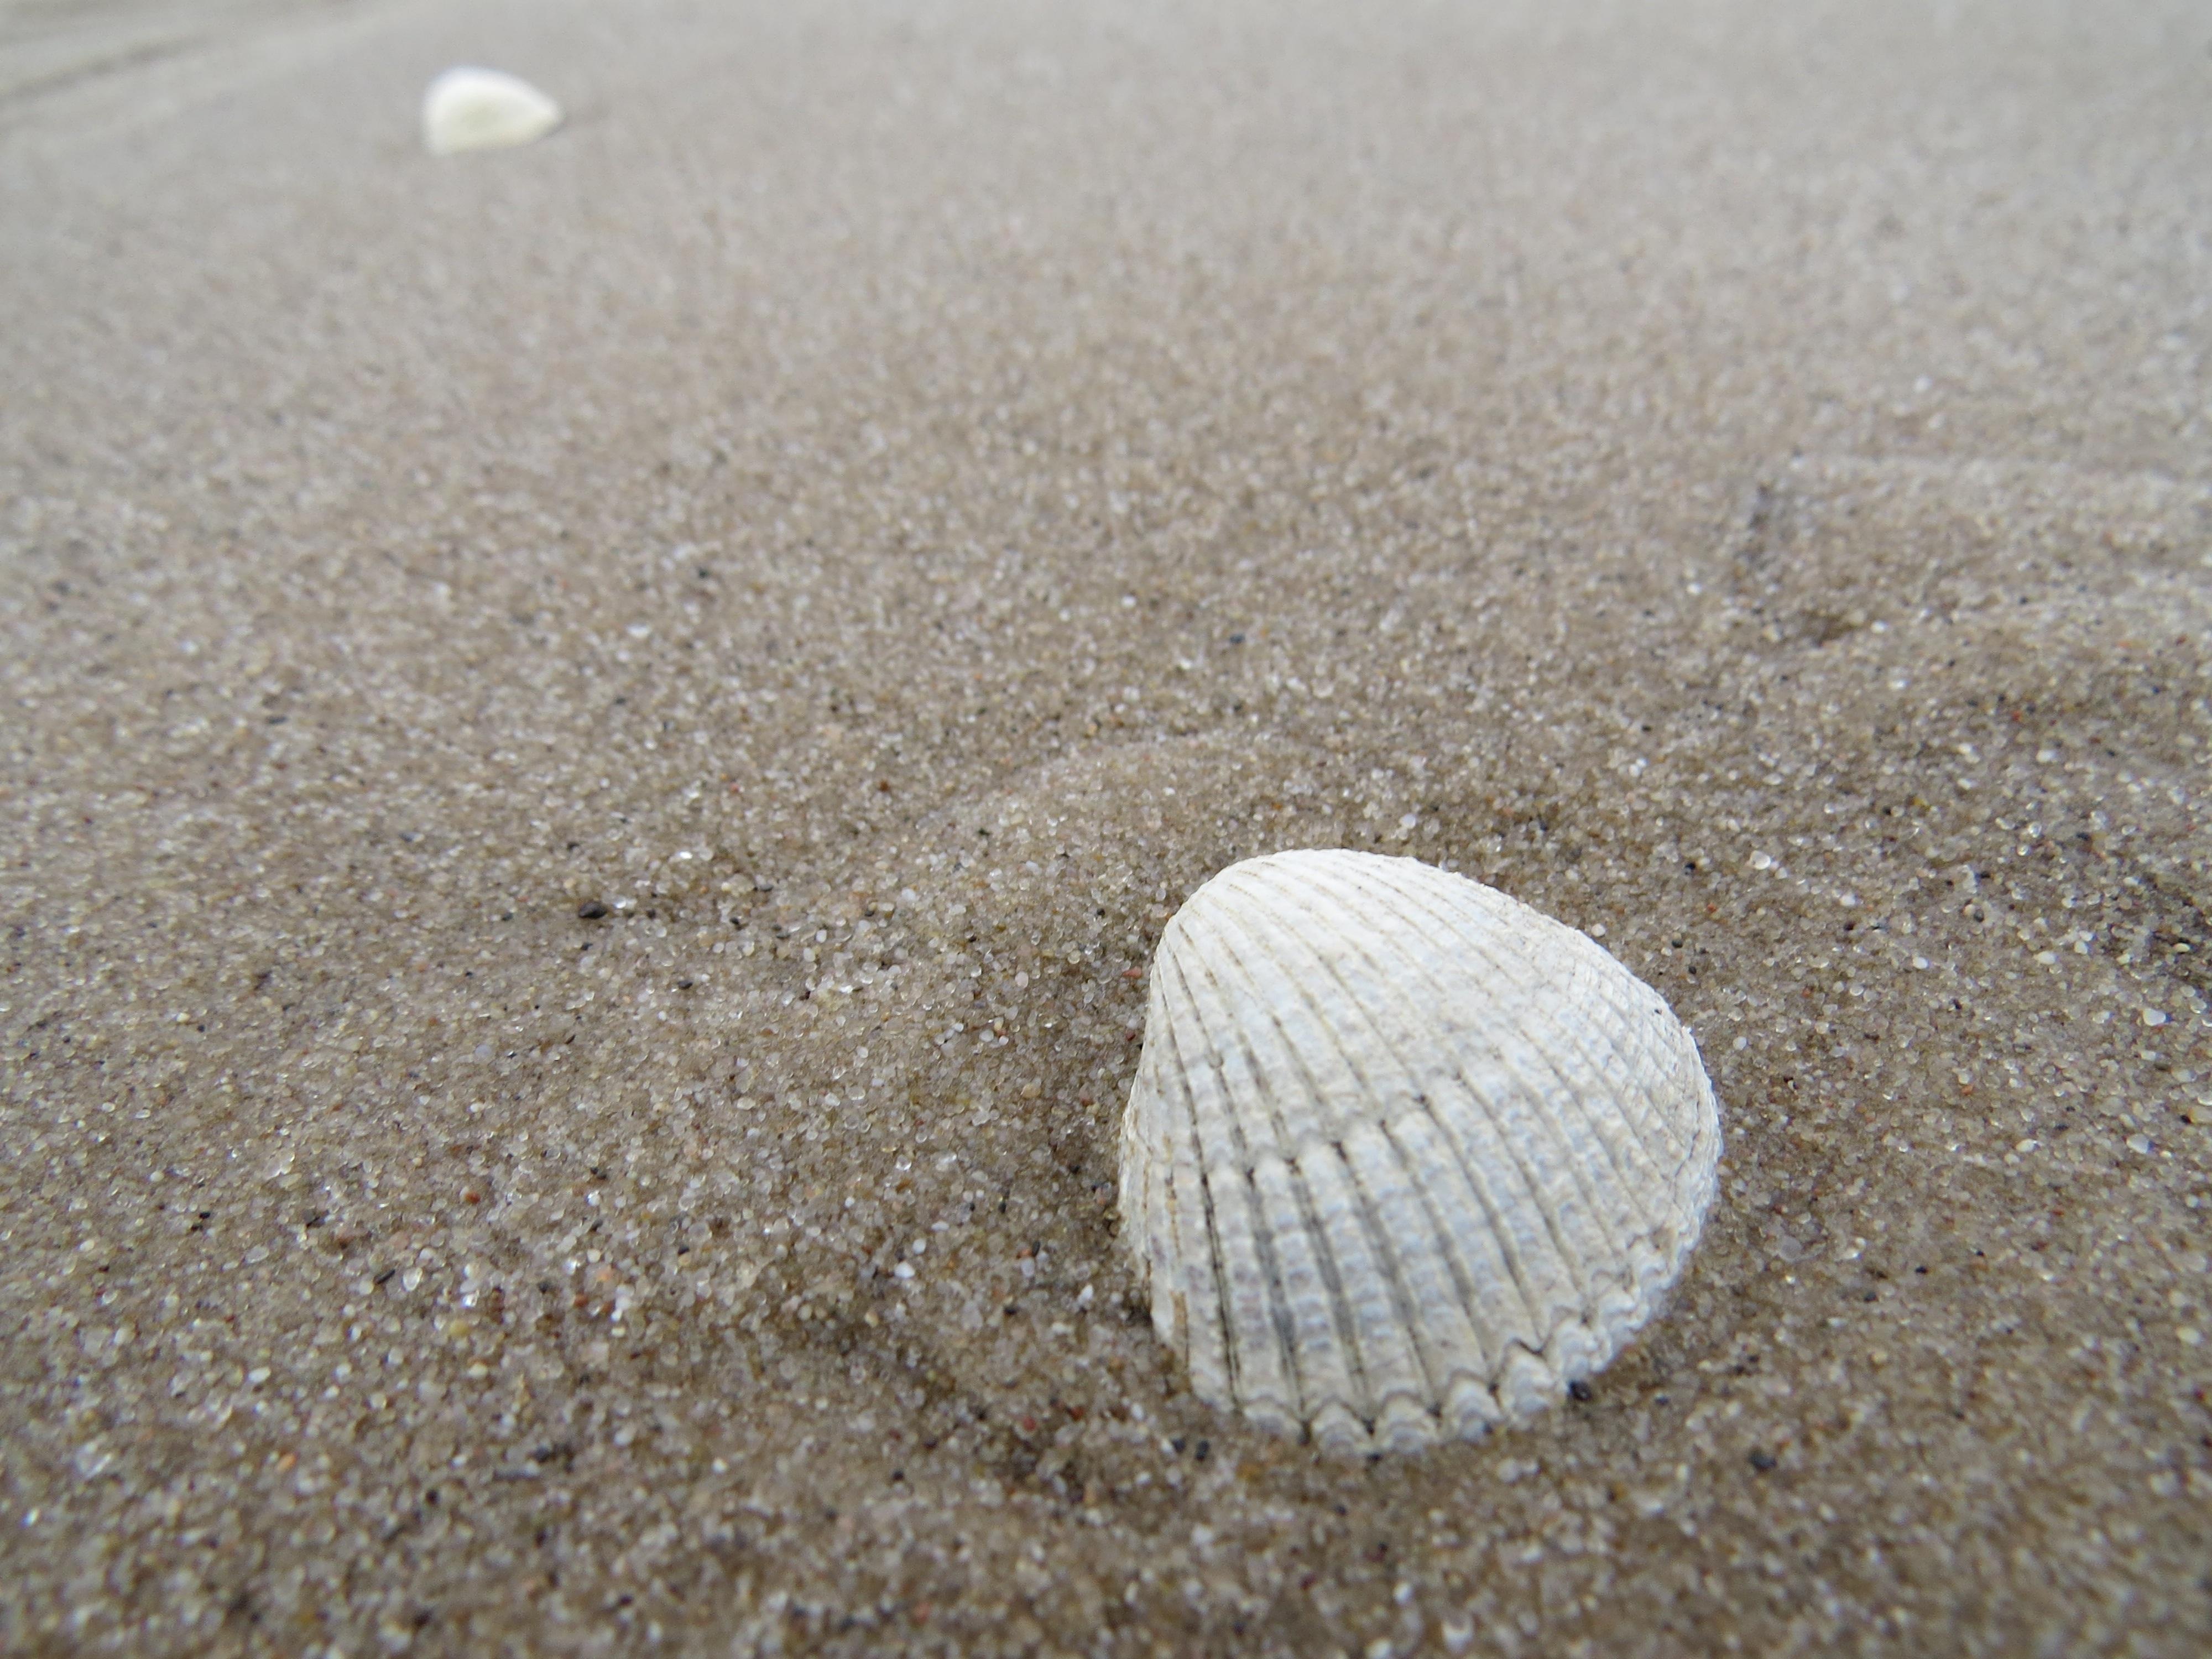 Gambar Alam Bahan Kulit Invertebrata Kerang Laut Laut Baltik